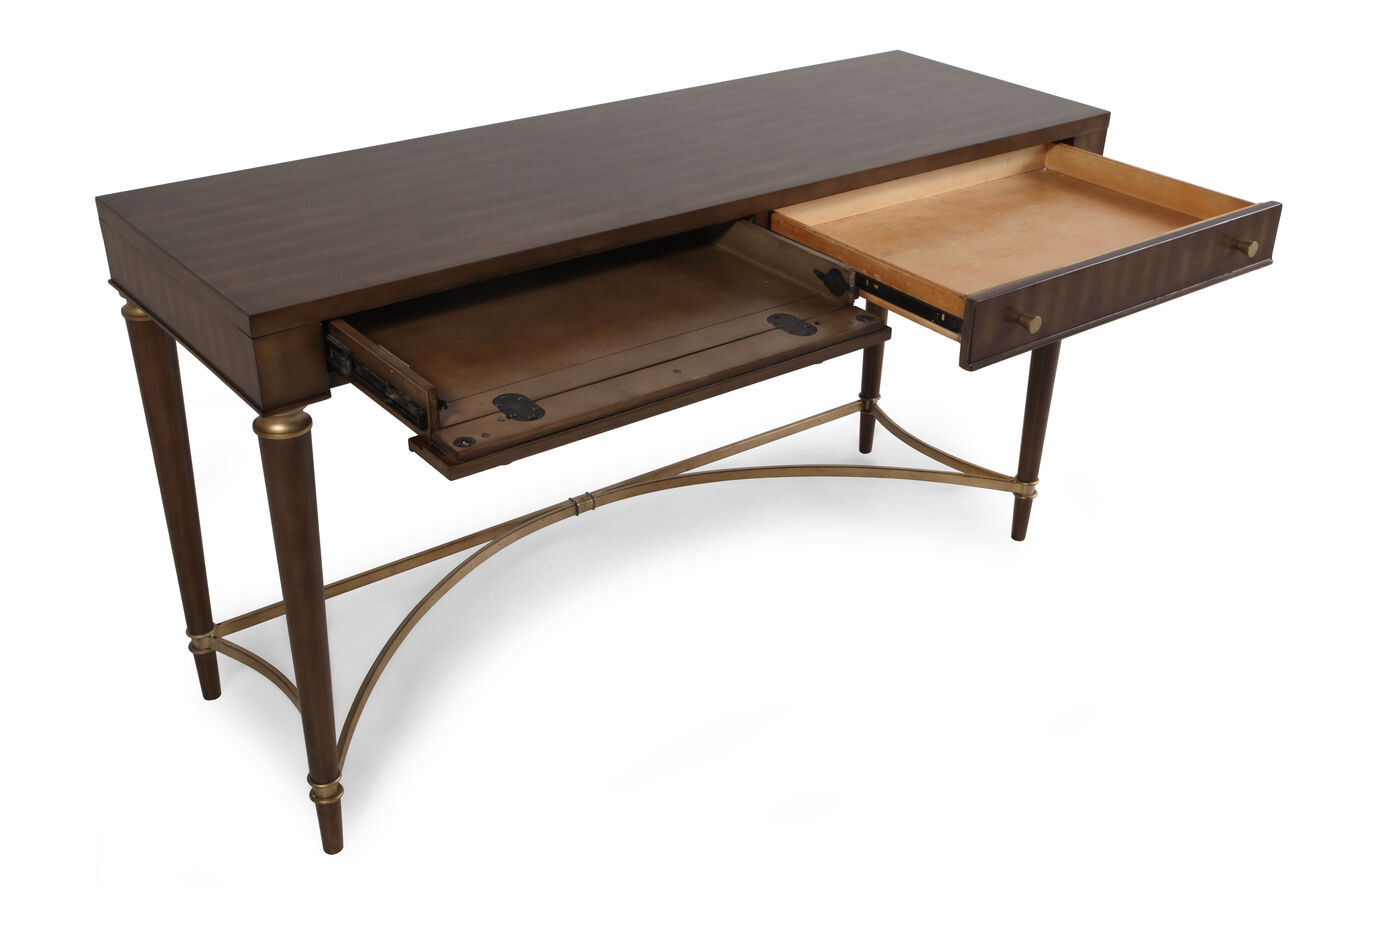 Broyhill Kristen Console Table